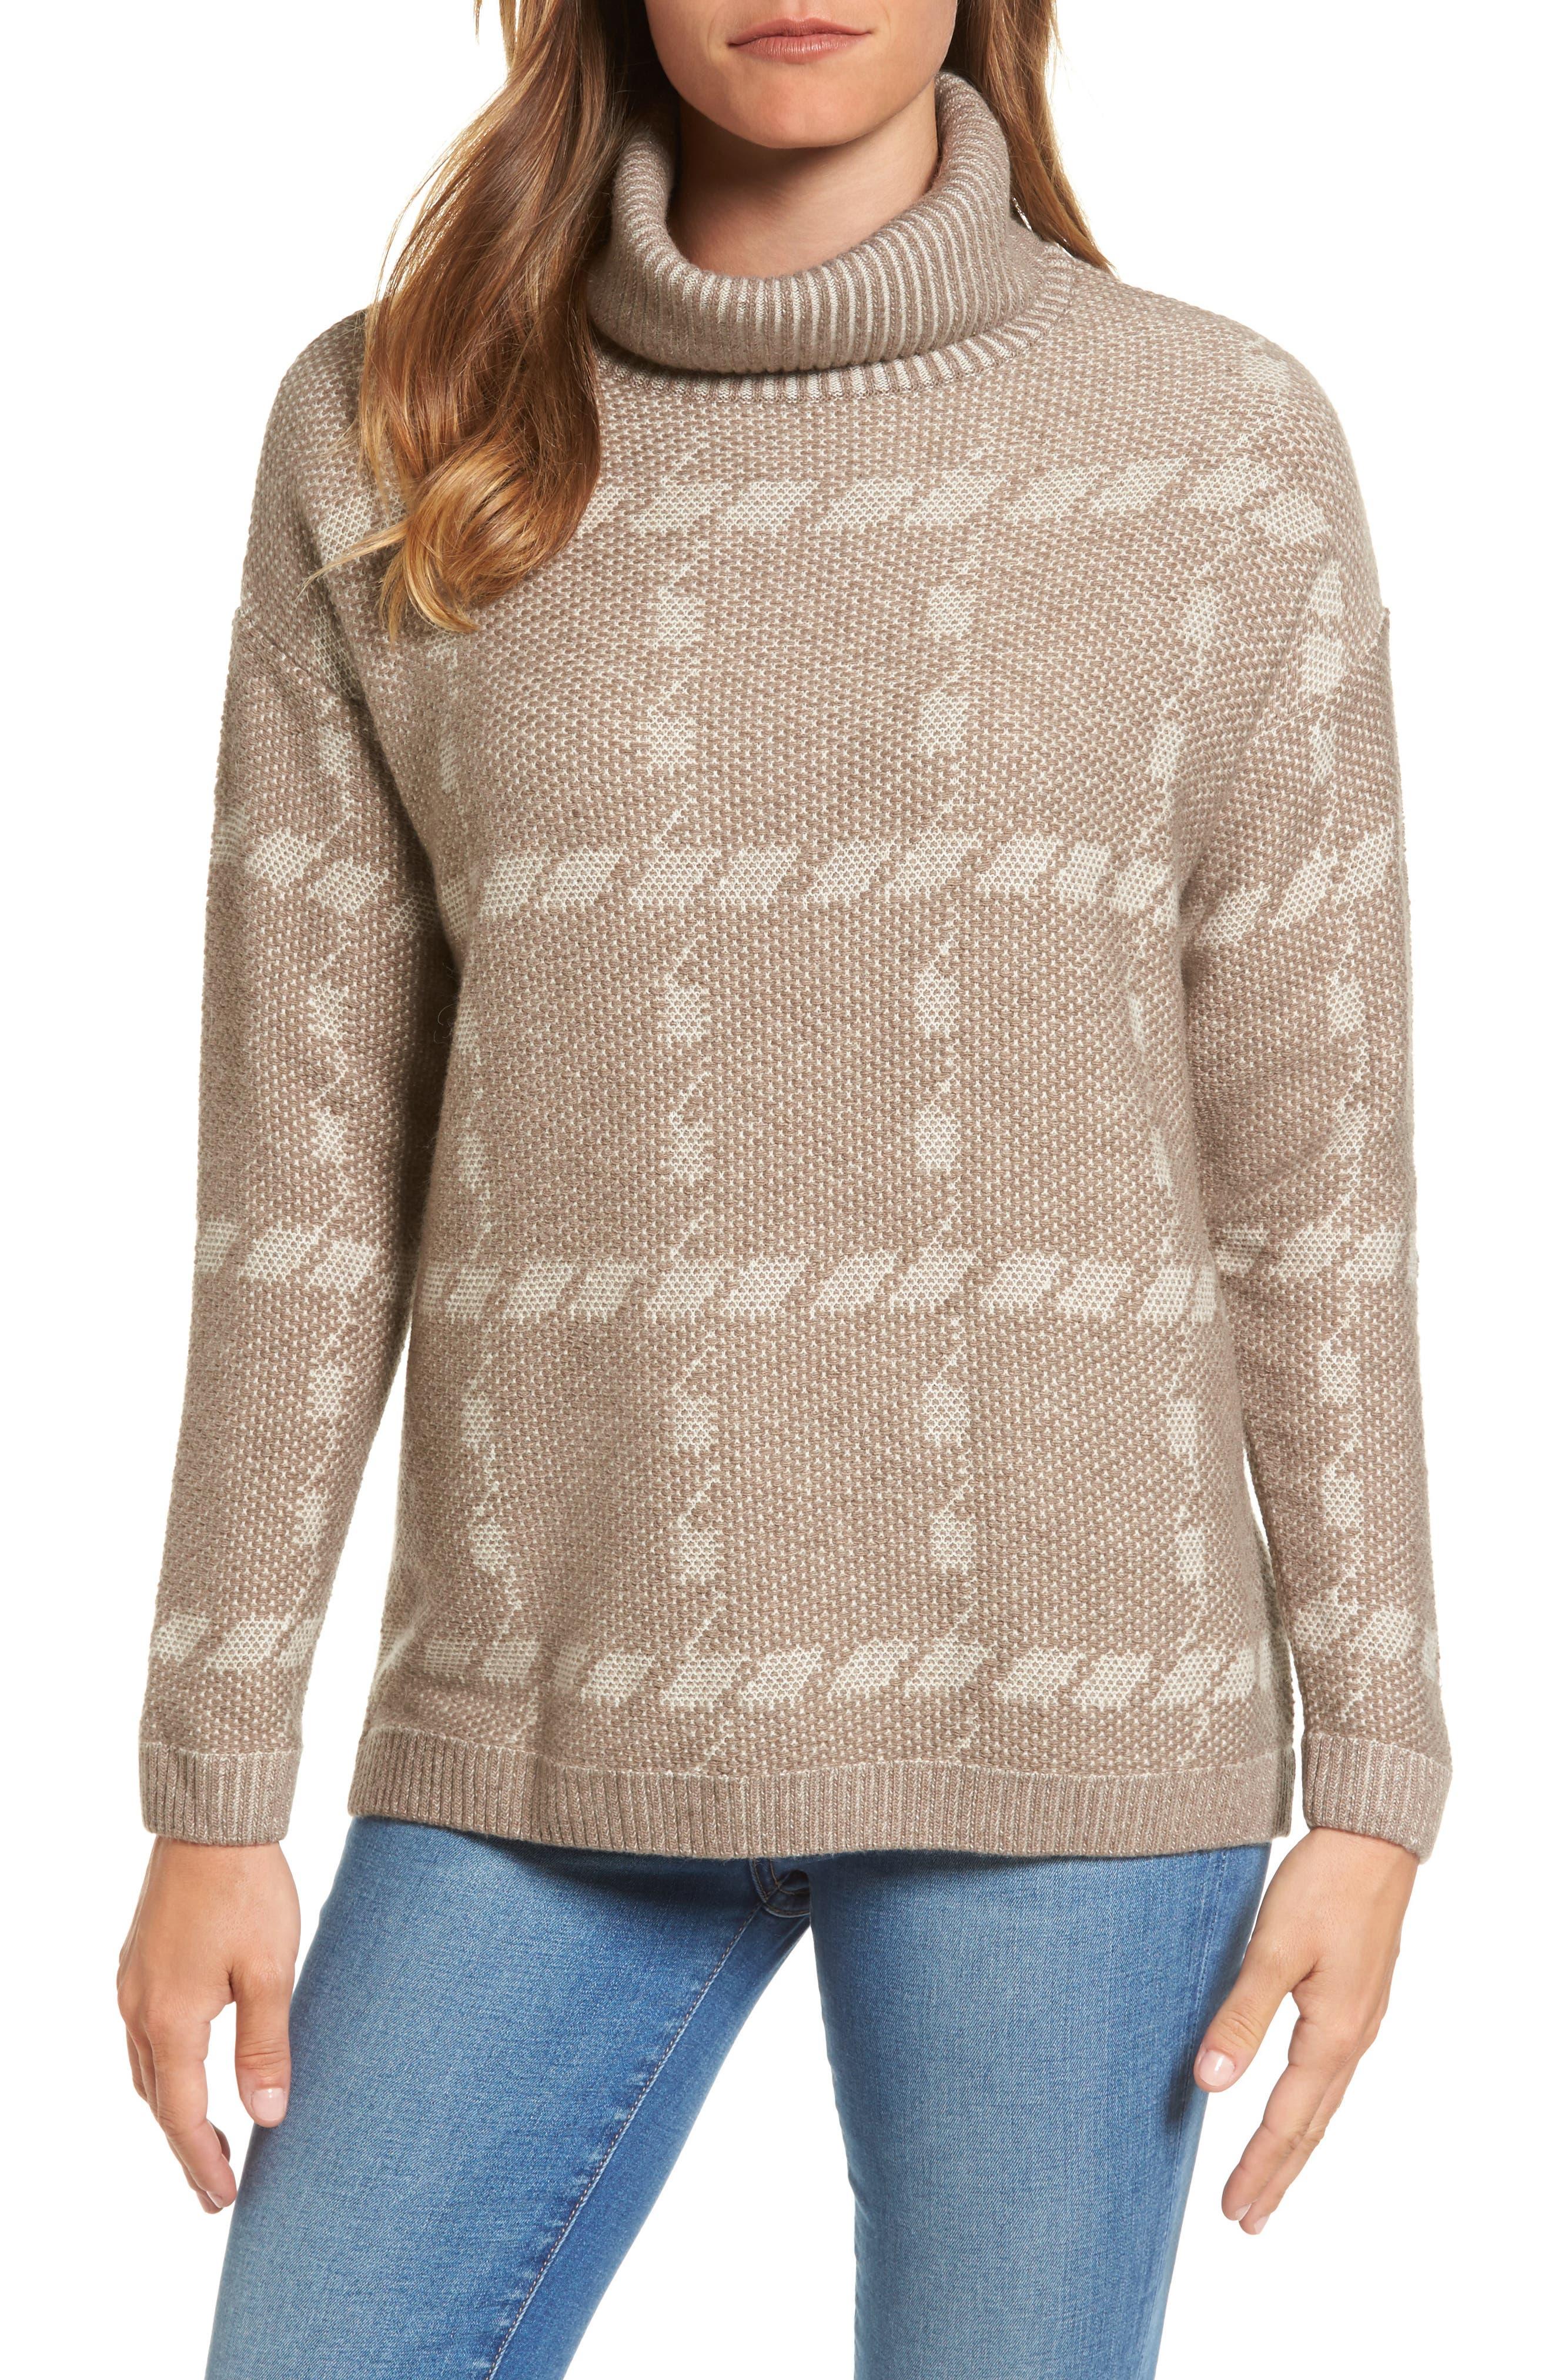 Main Image - Barbour Glen Knit Merino Wool Blend Turtleneck Sweater